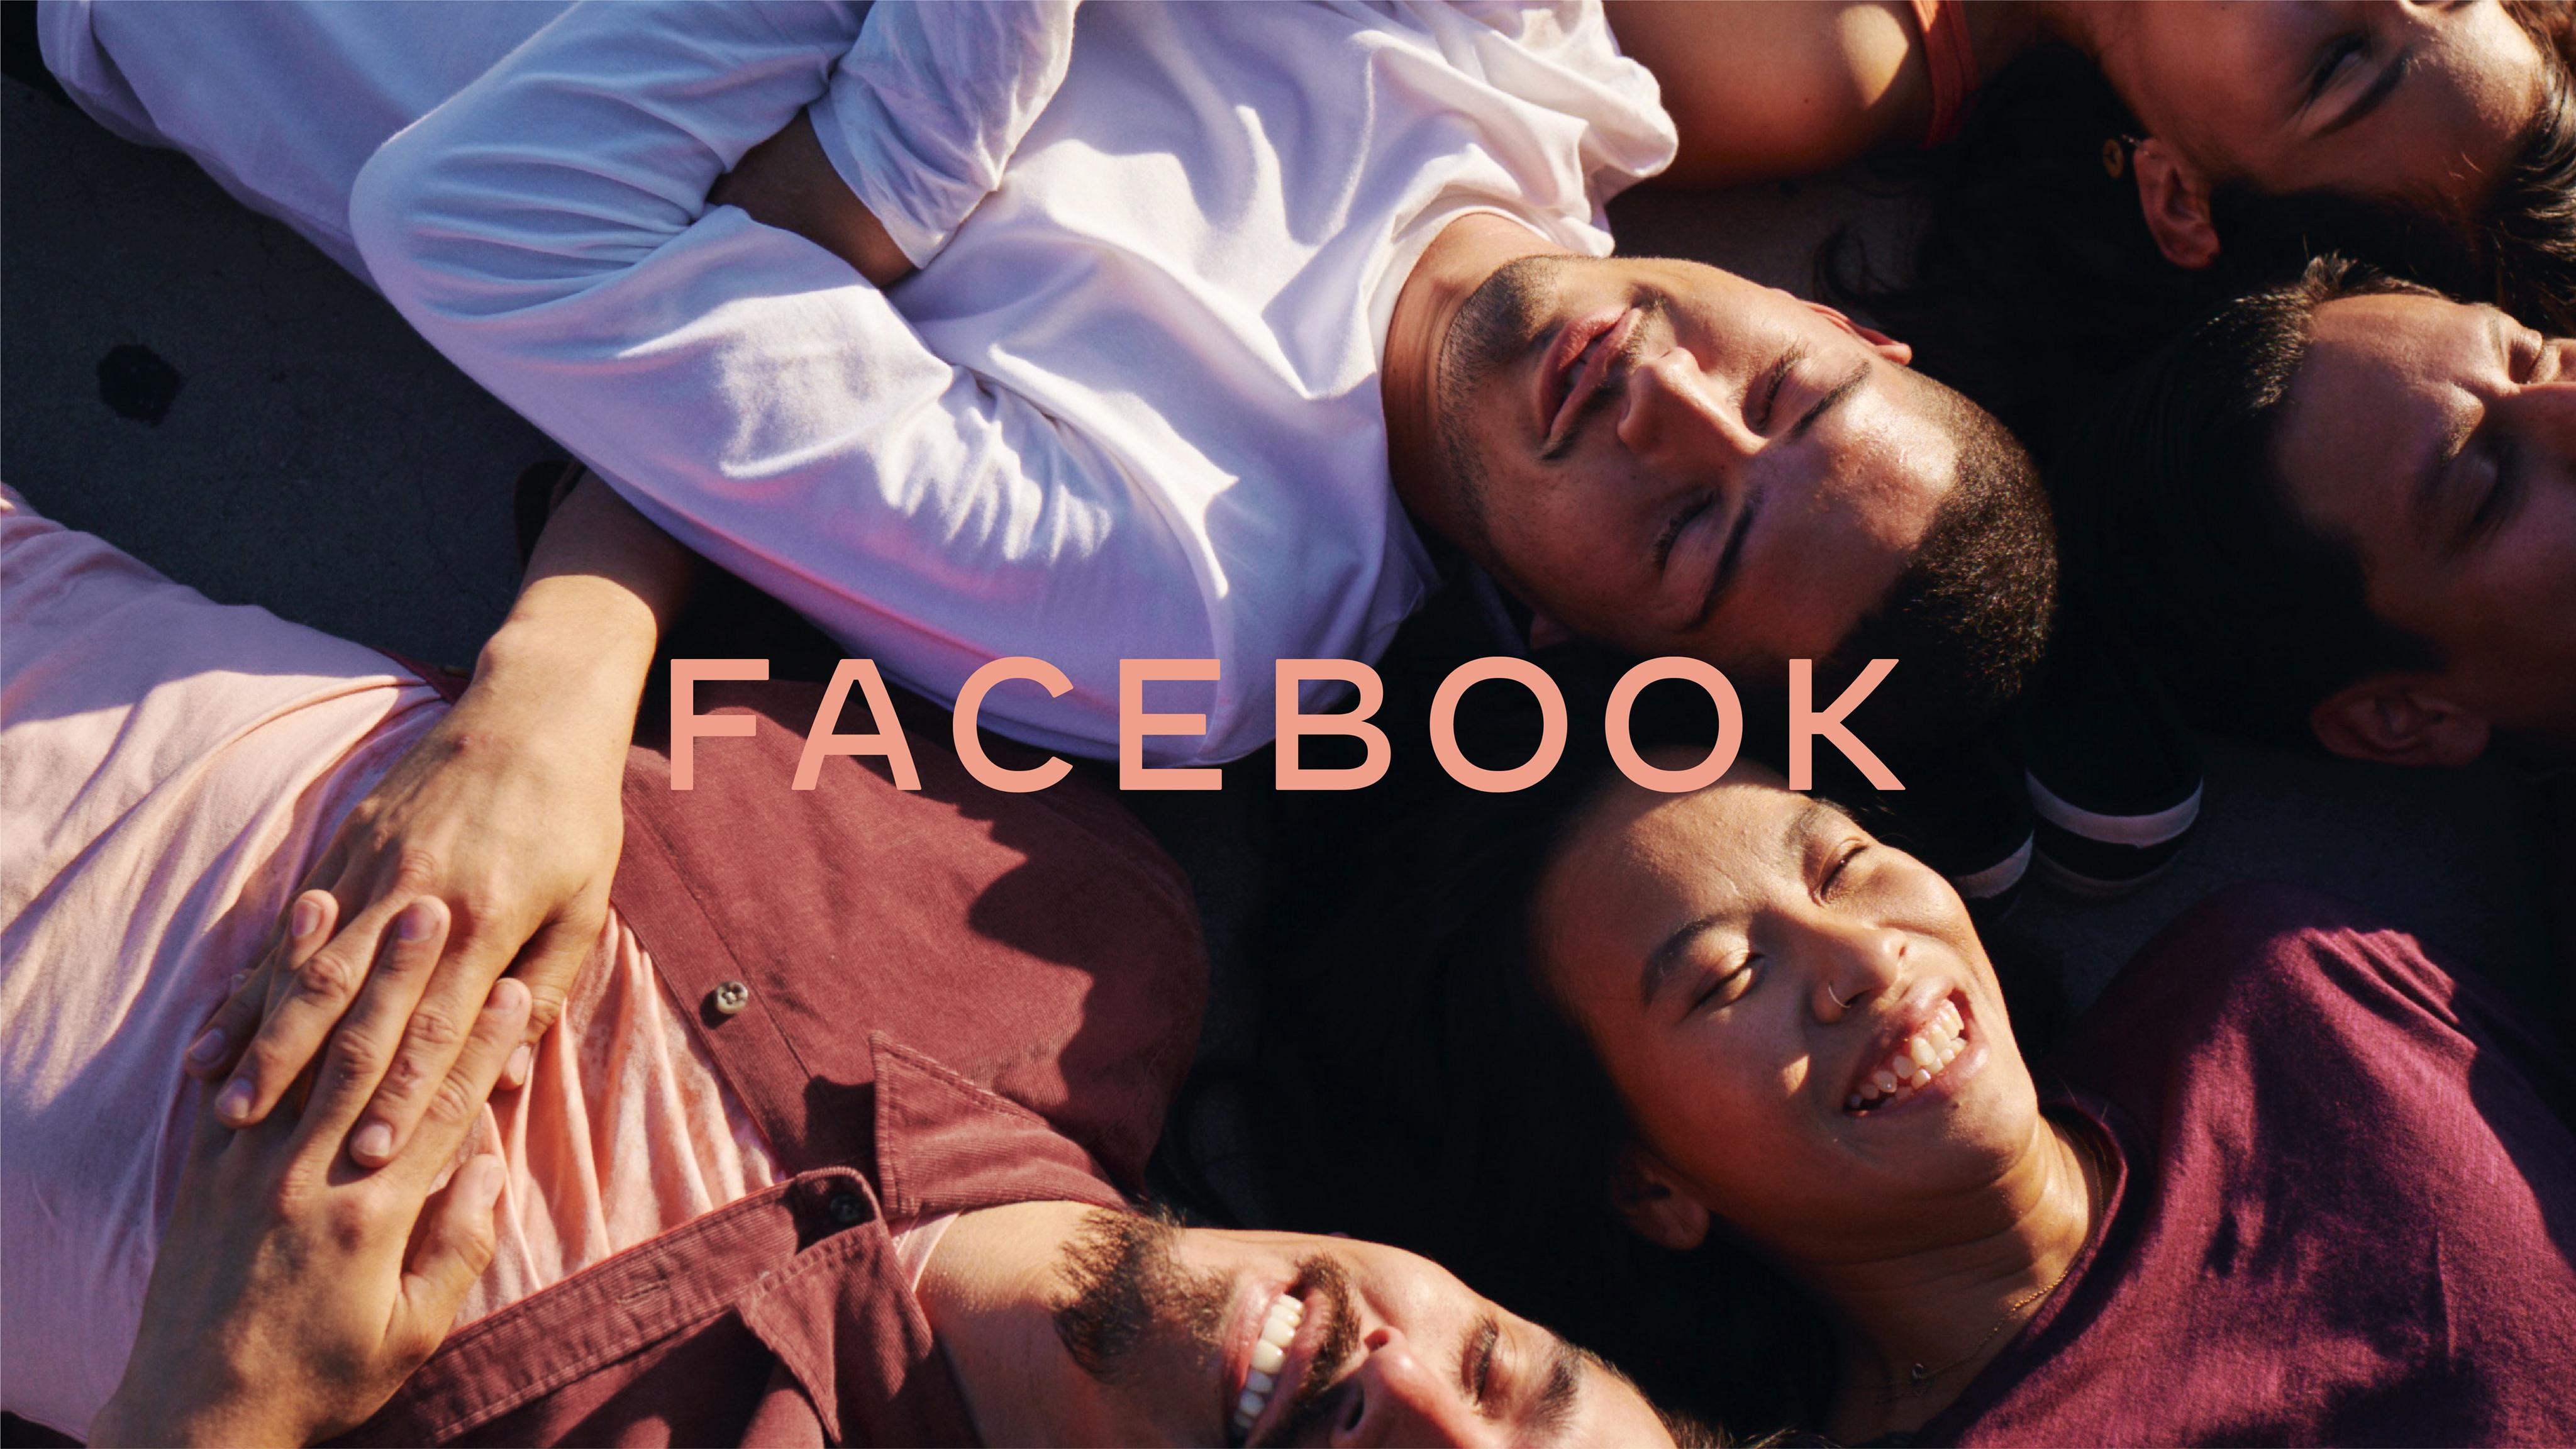 new Facebook company brand